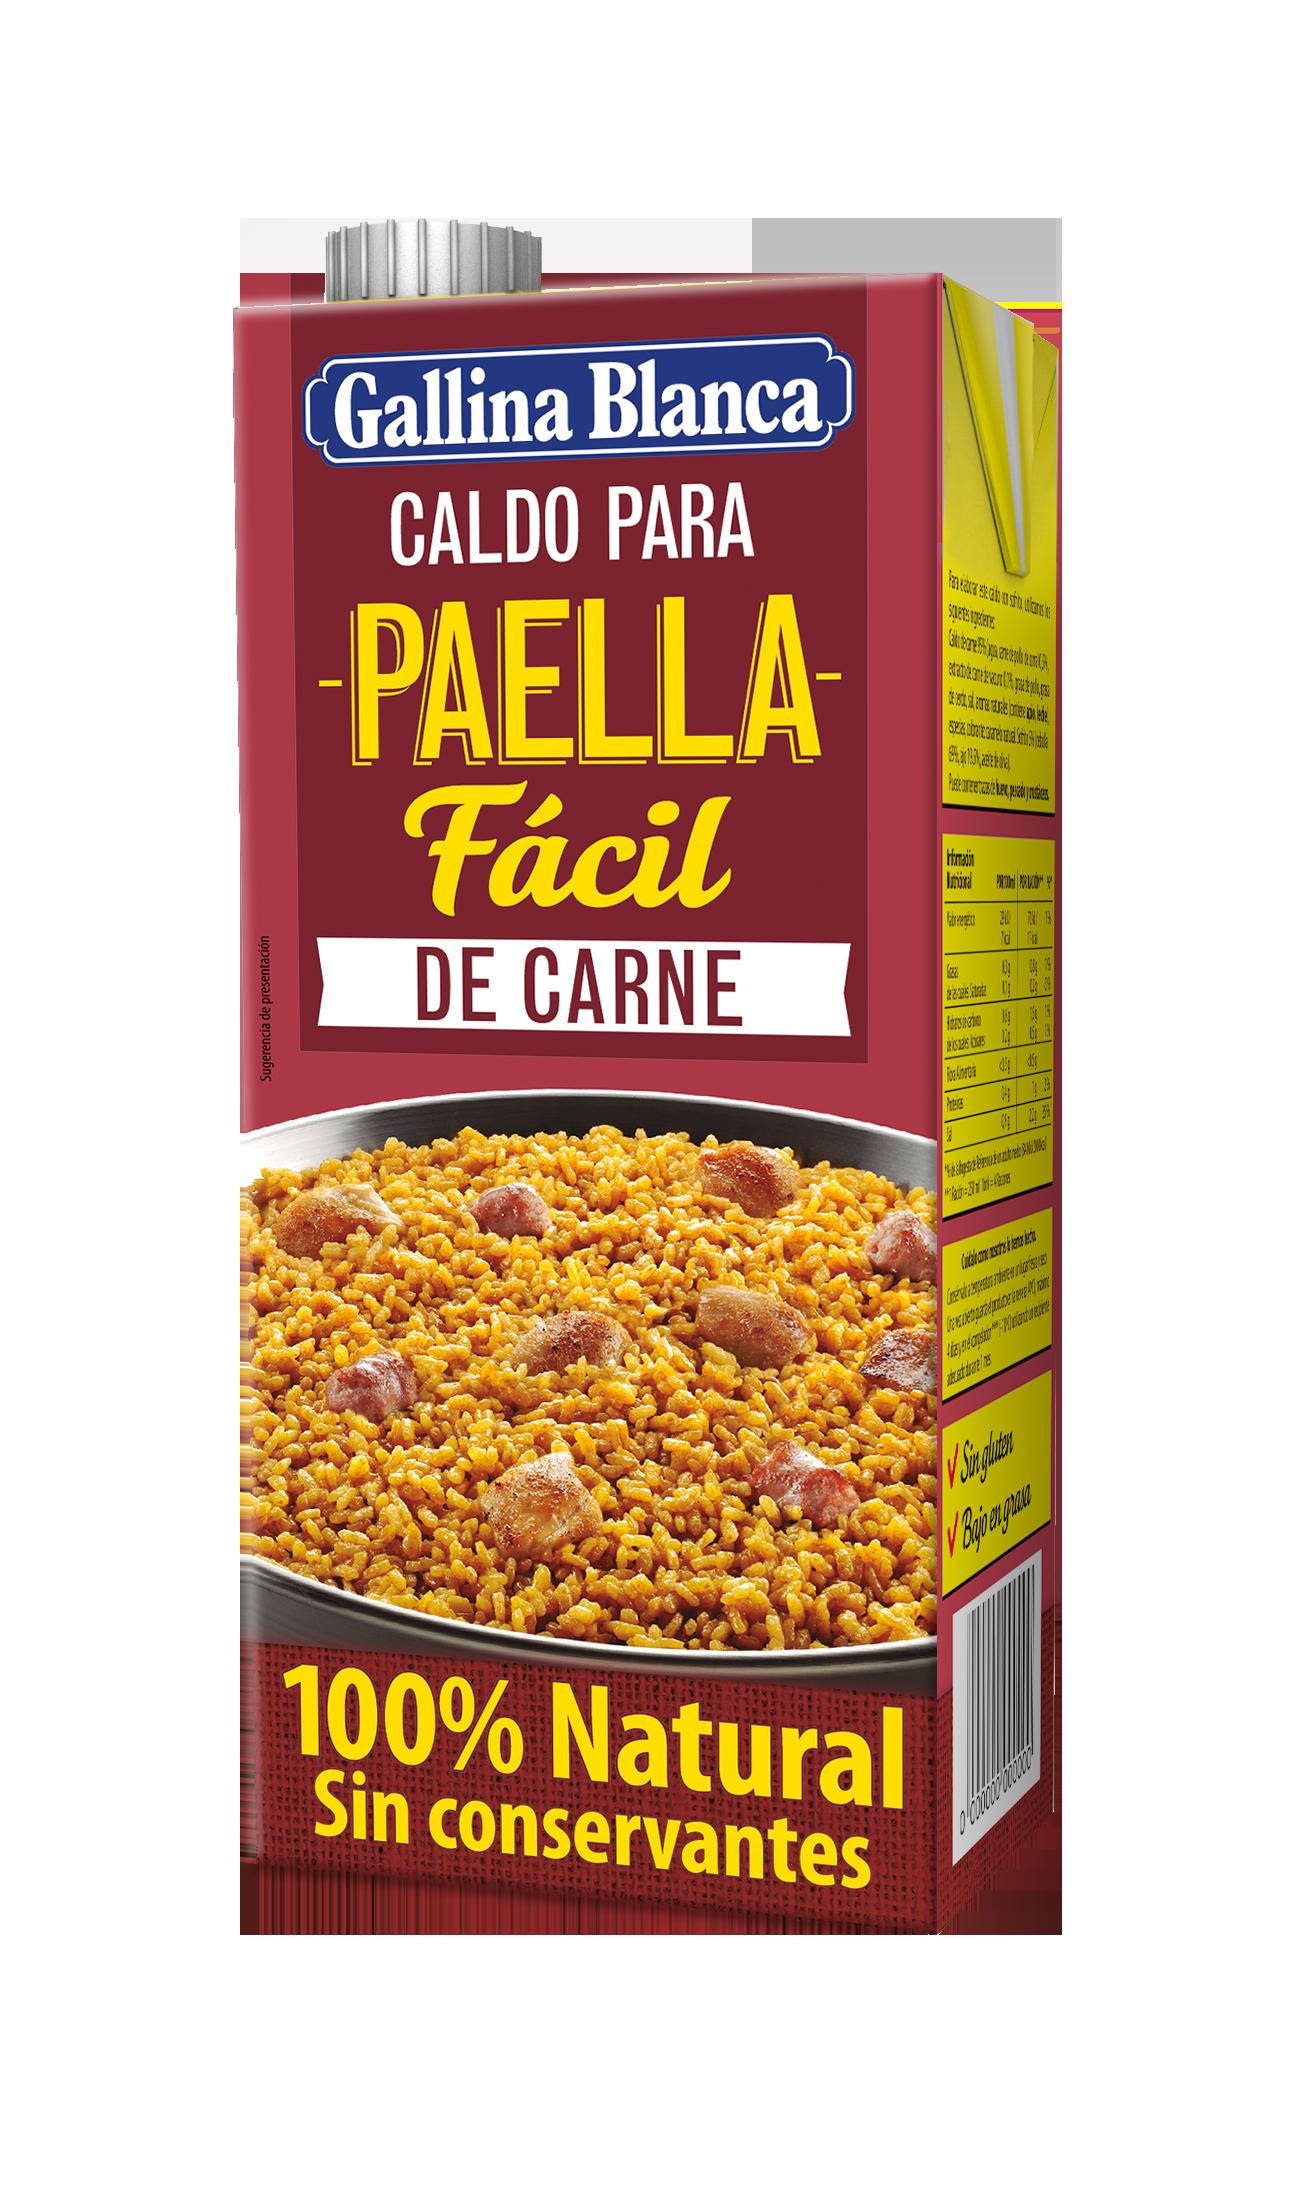 Caldo para Paella Fácil de Carne 100% Natural